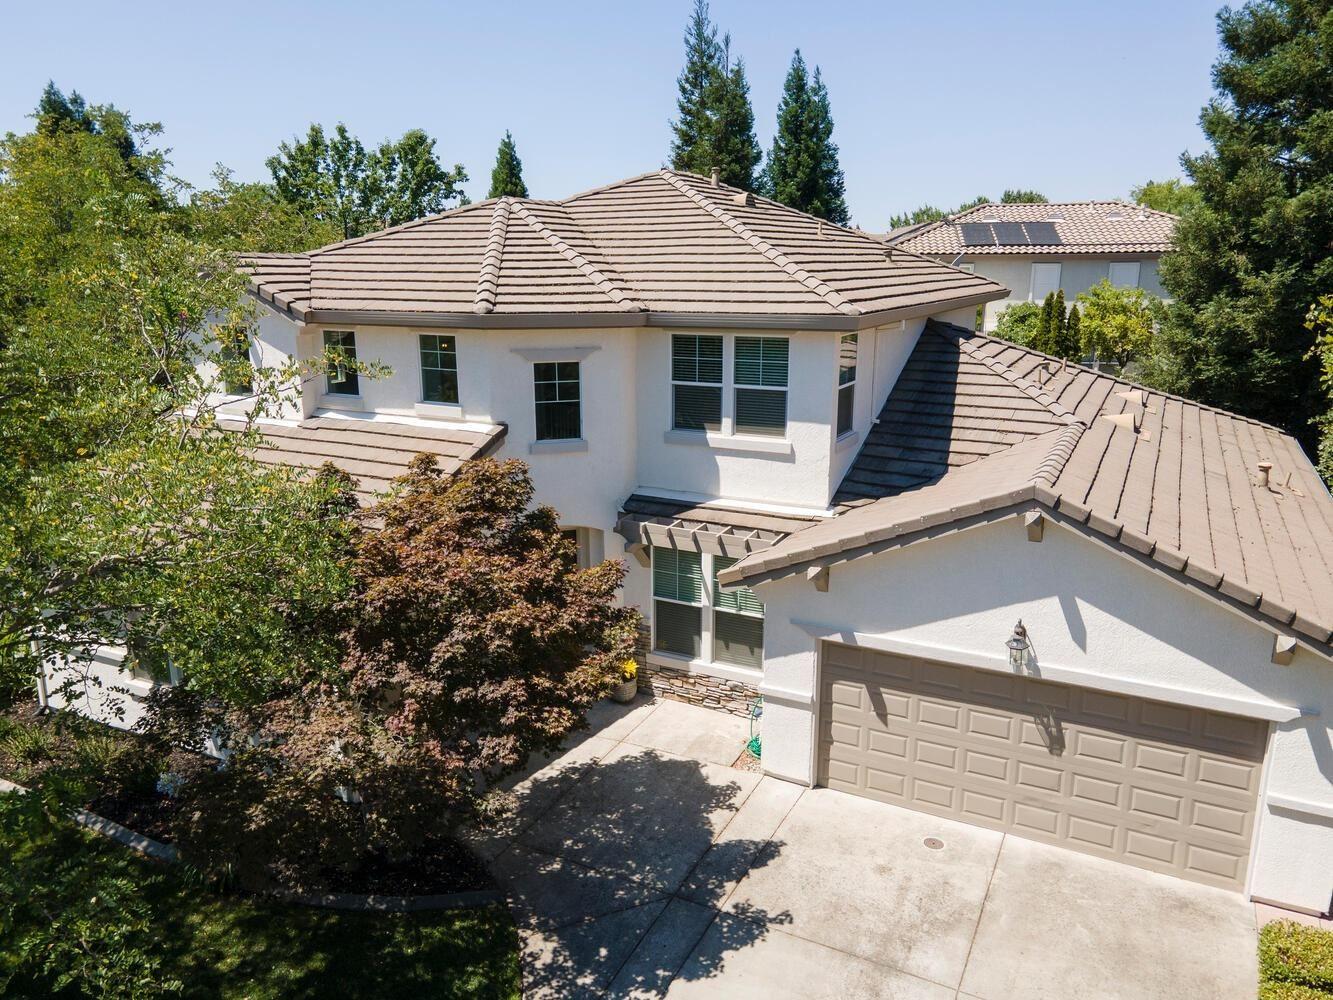 Photo of 2509 Macero Street, Roseville, CA 95747 (MLS # 221066392)